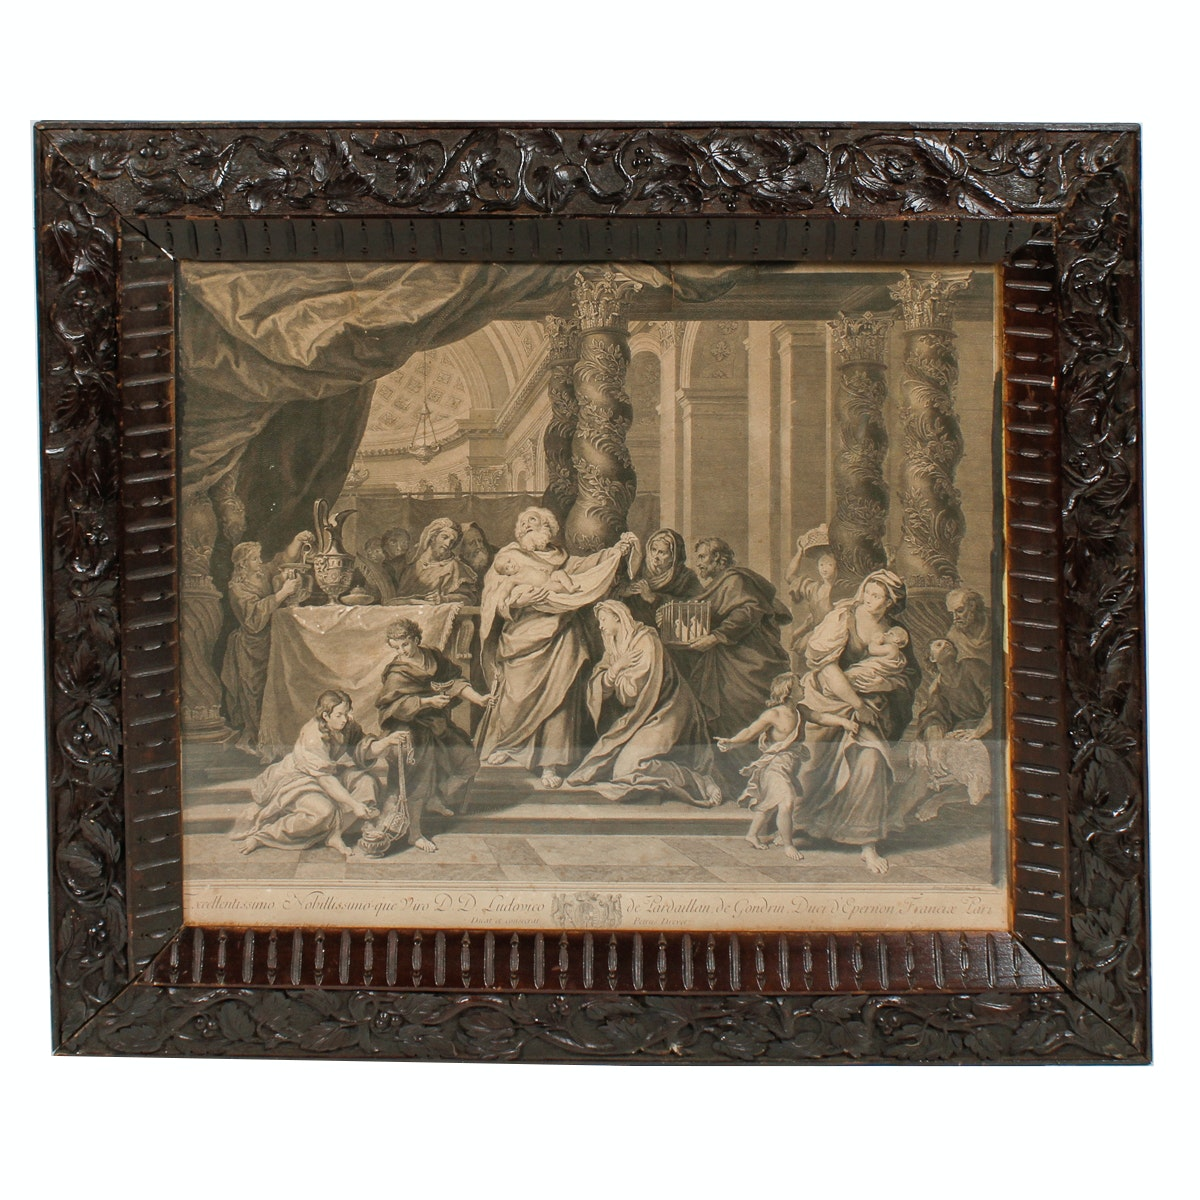 Antique Pierre Drevet Engraving with Ornately Carved Frame